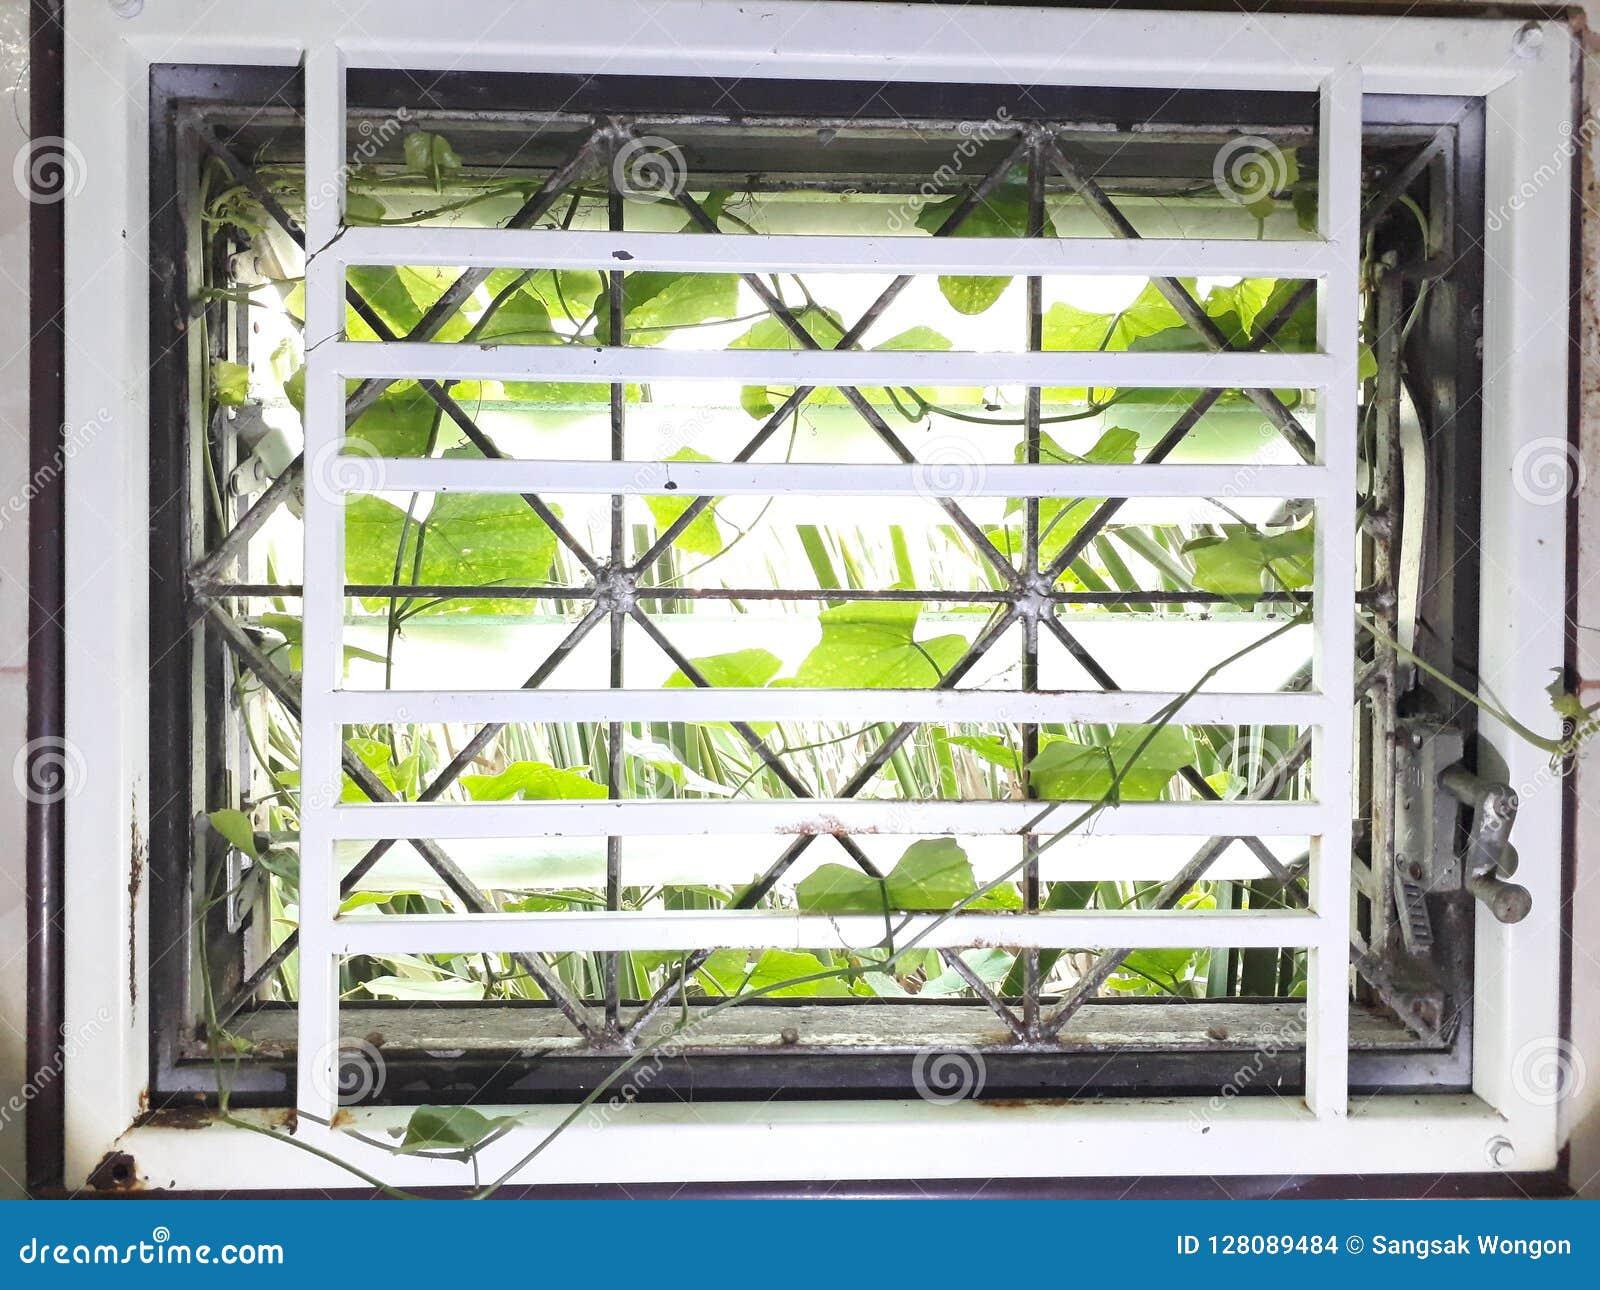 Засорители в дом Через зазор стеклянного окна